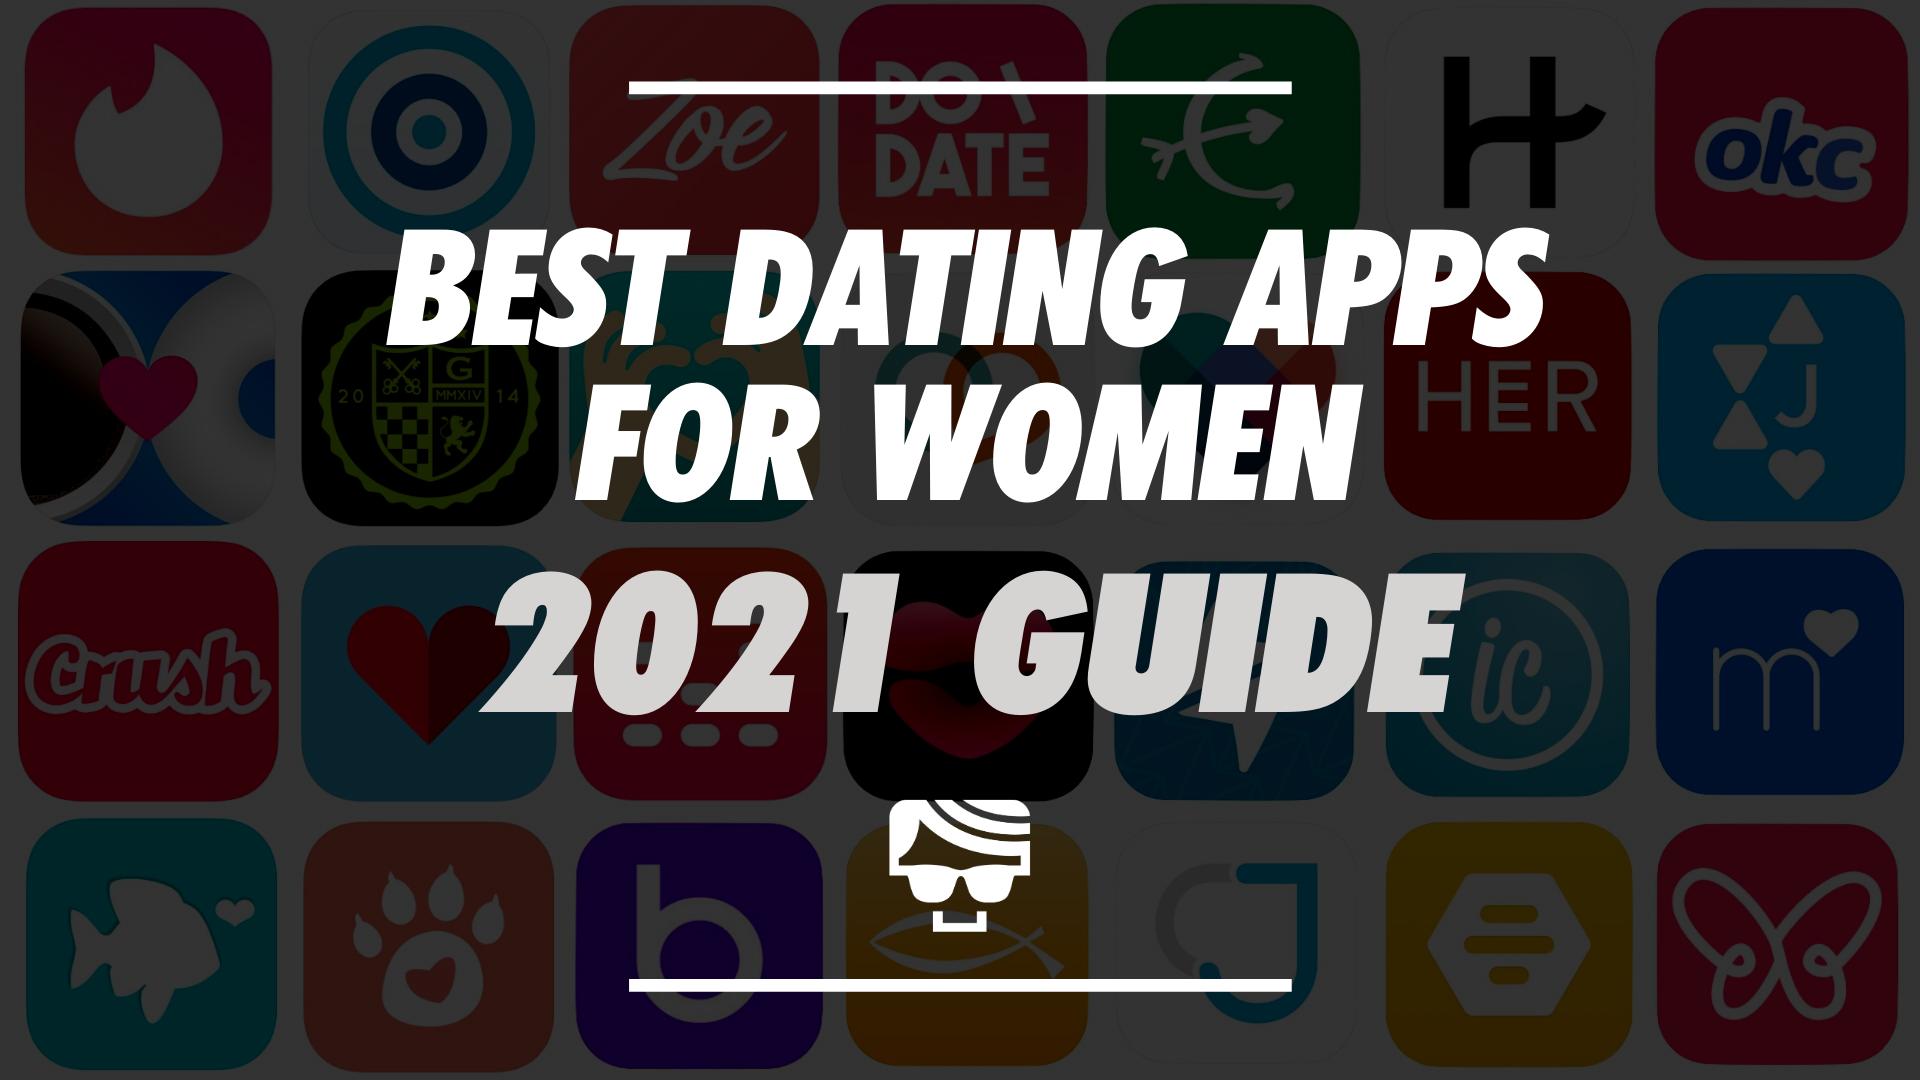 Best Dating Apps for Women